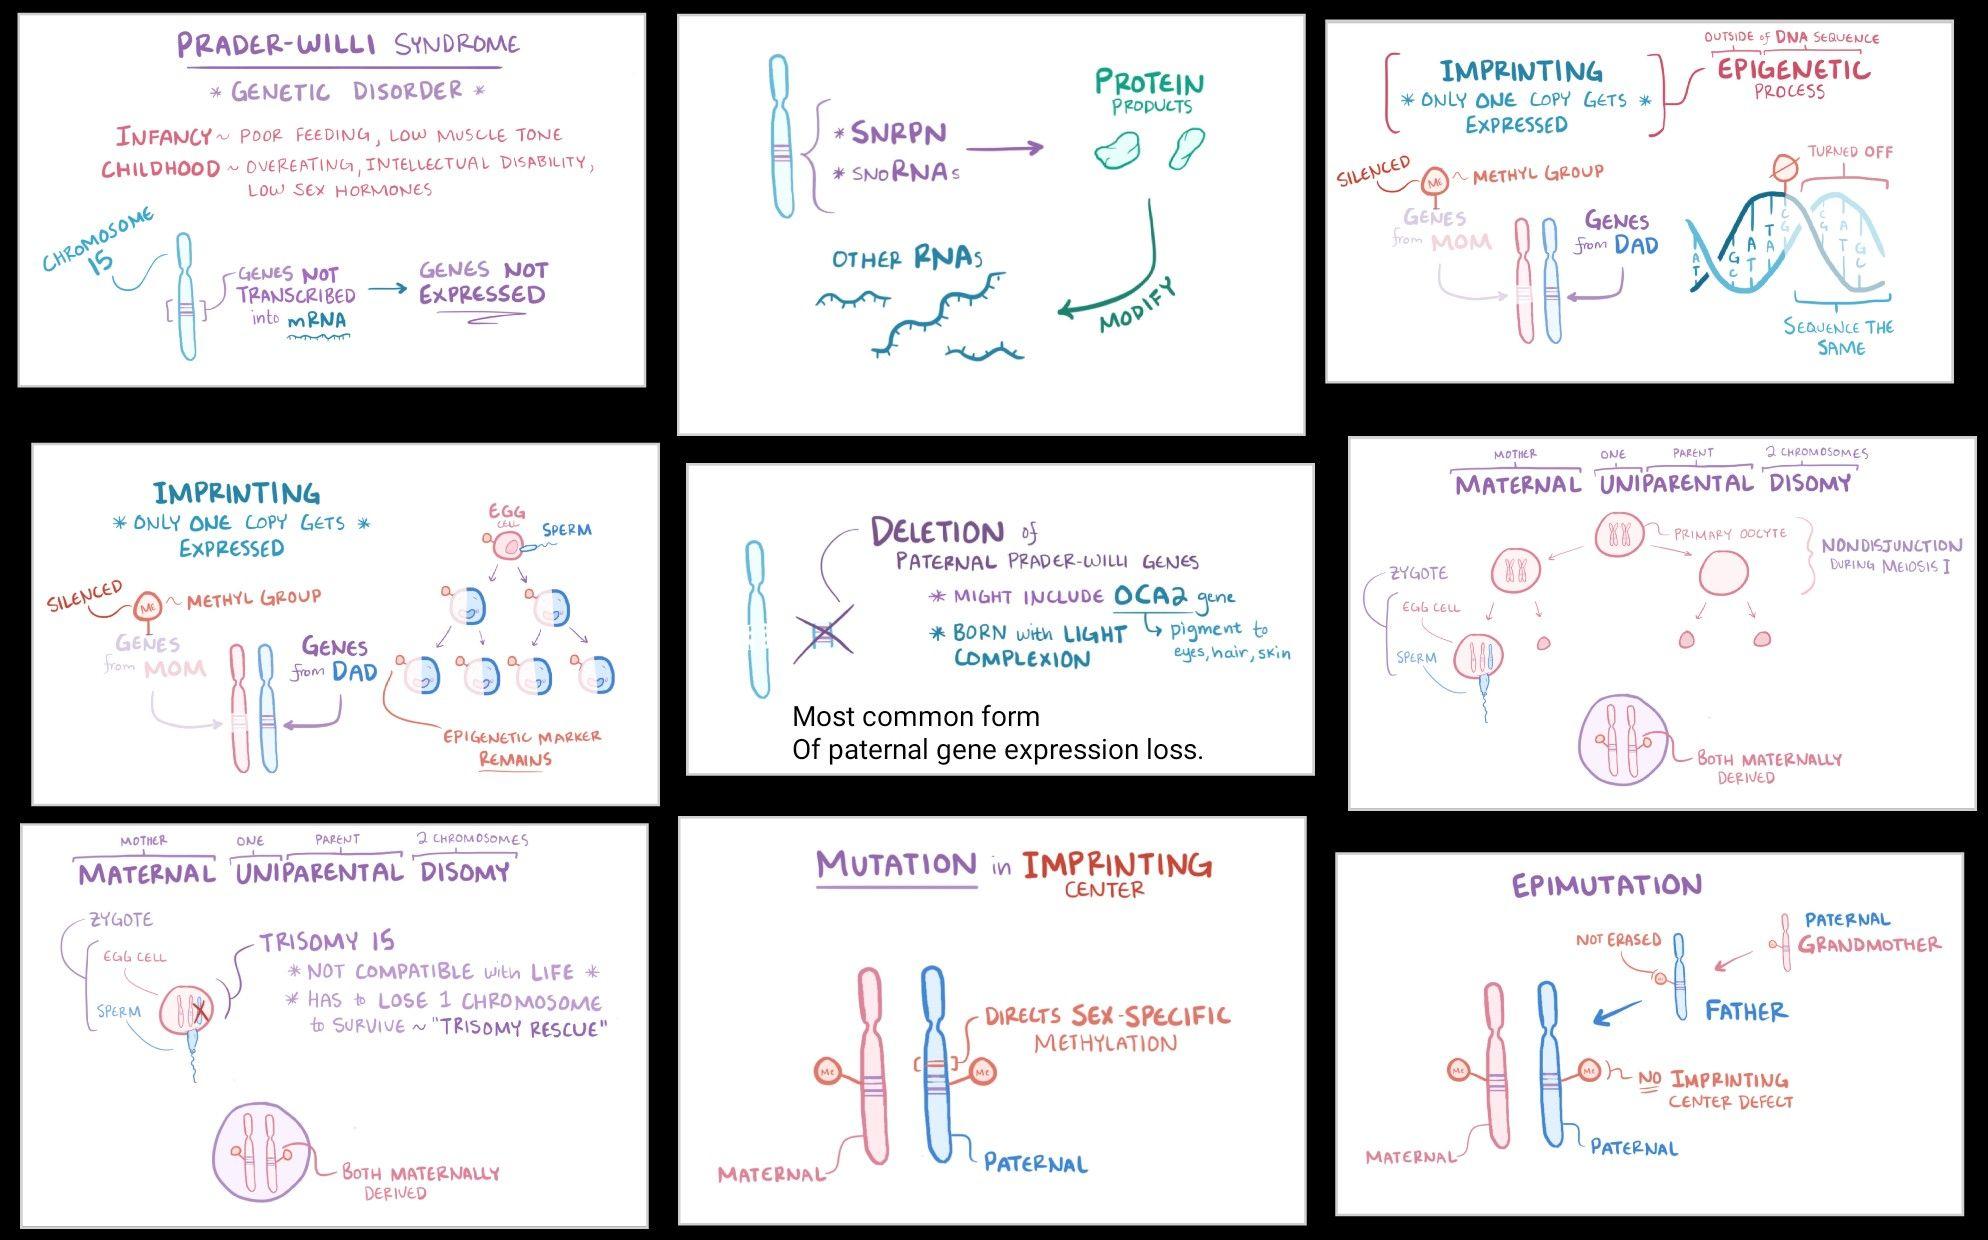 Prader willi syndrome _01 uniparental disomy imprinting epigenetics